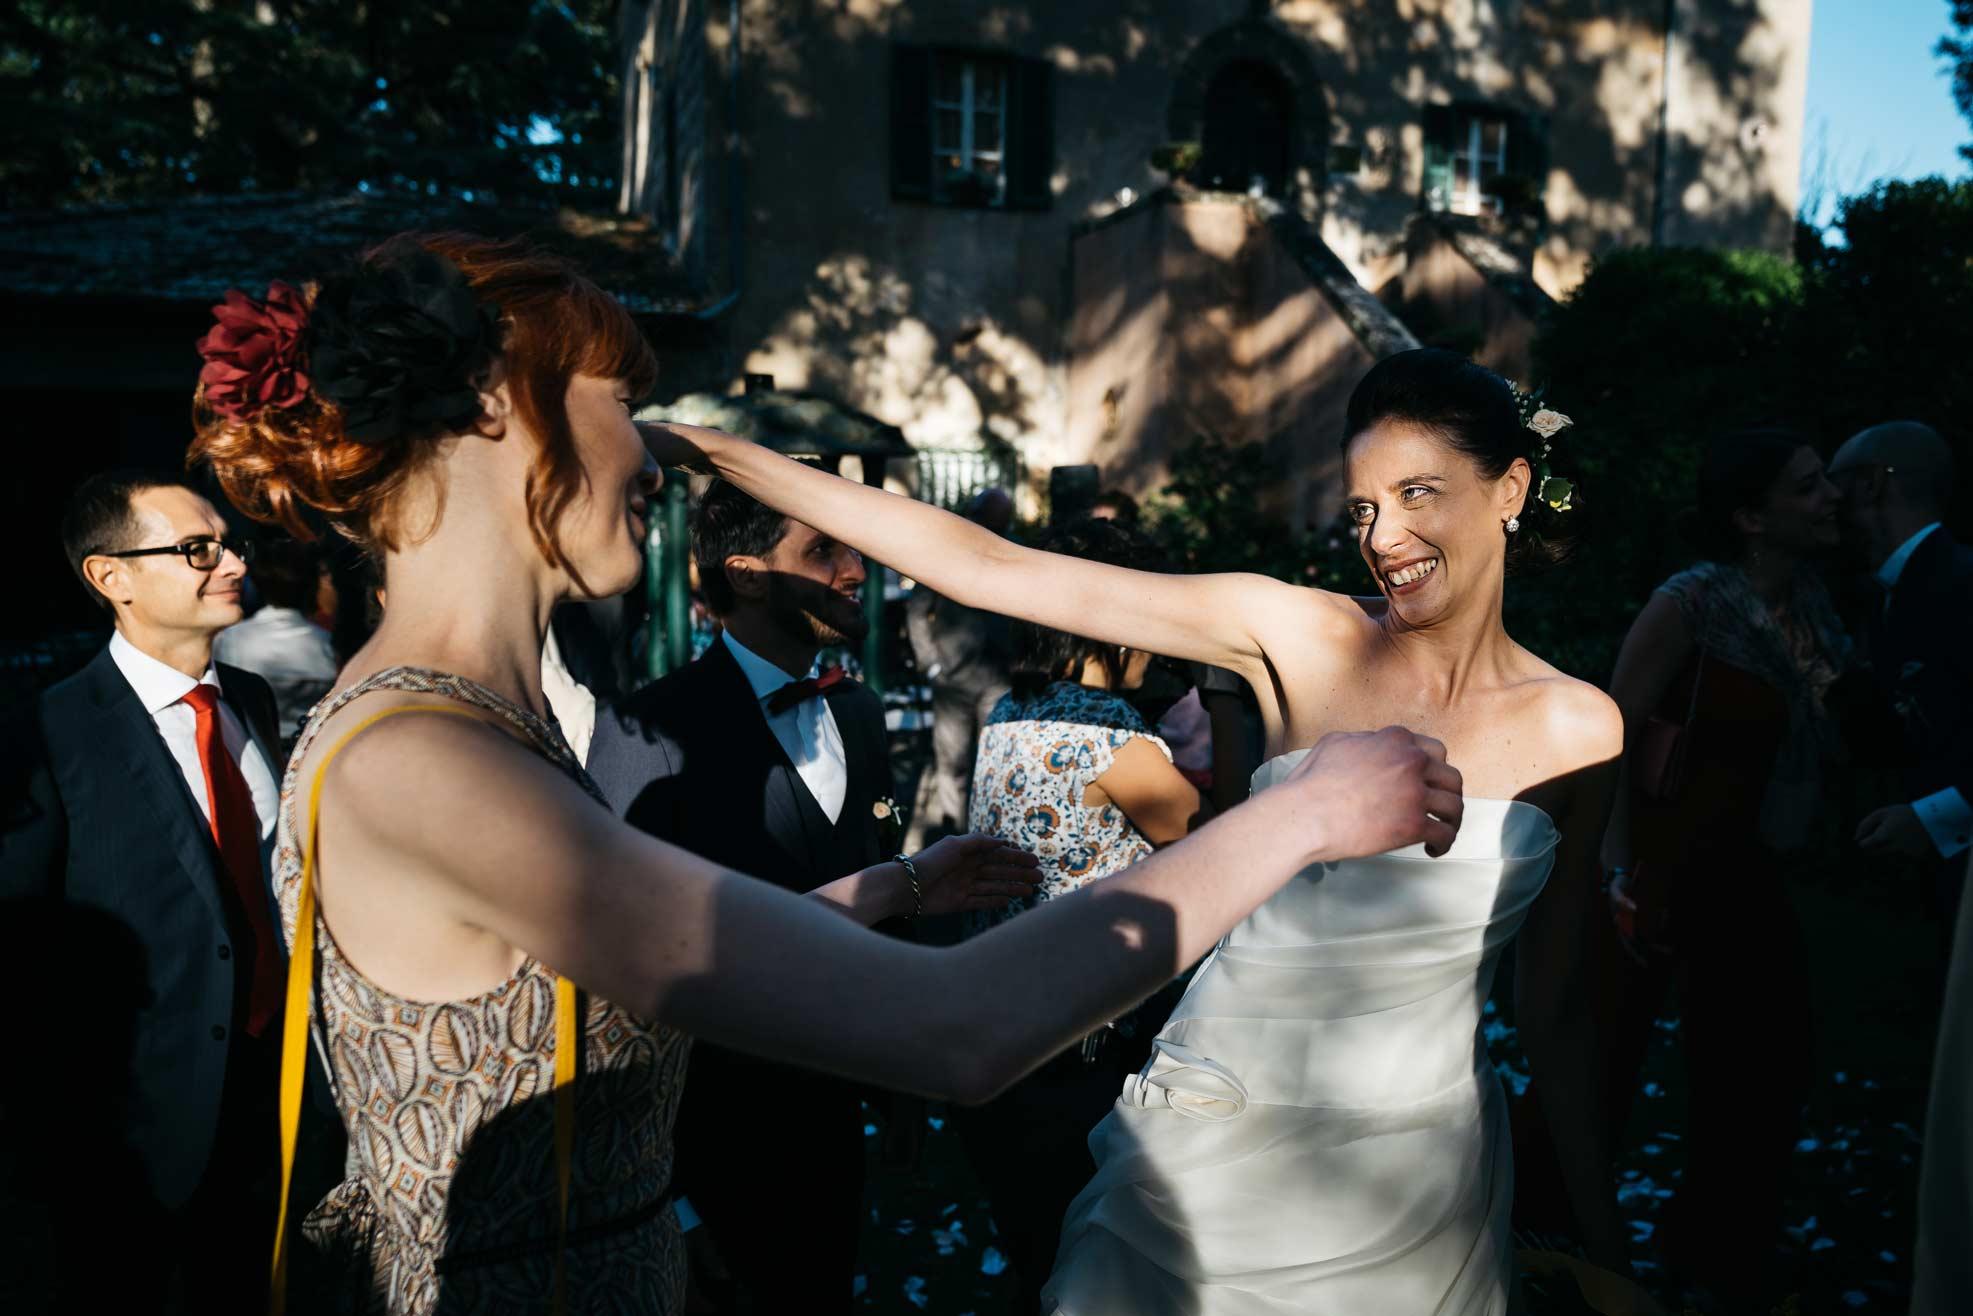 Fotoreportage-Matrimonio-Fotografo-Matrimonio-Roma-Fotoreportage-L&F